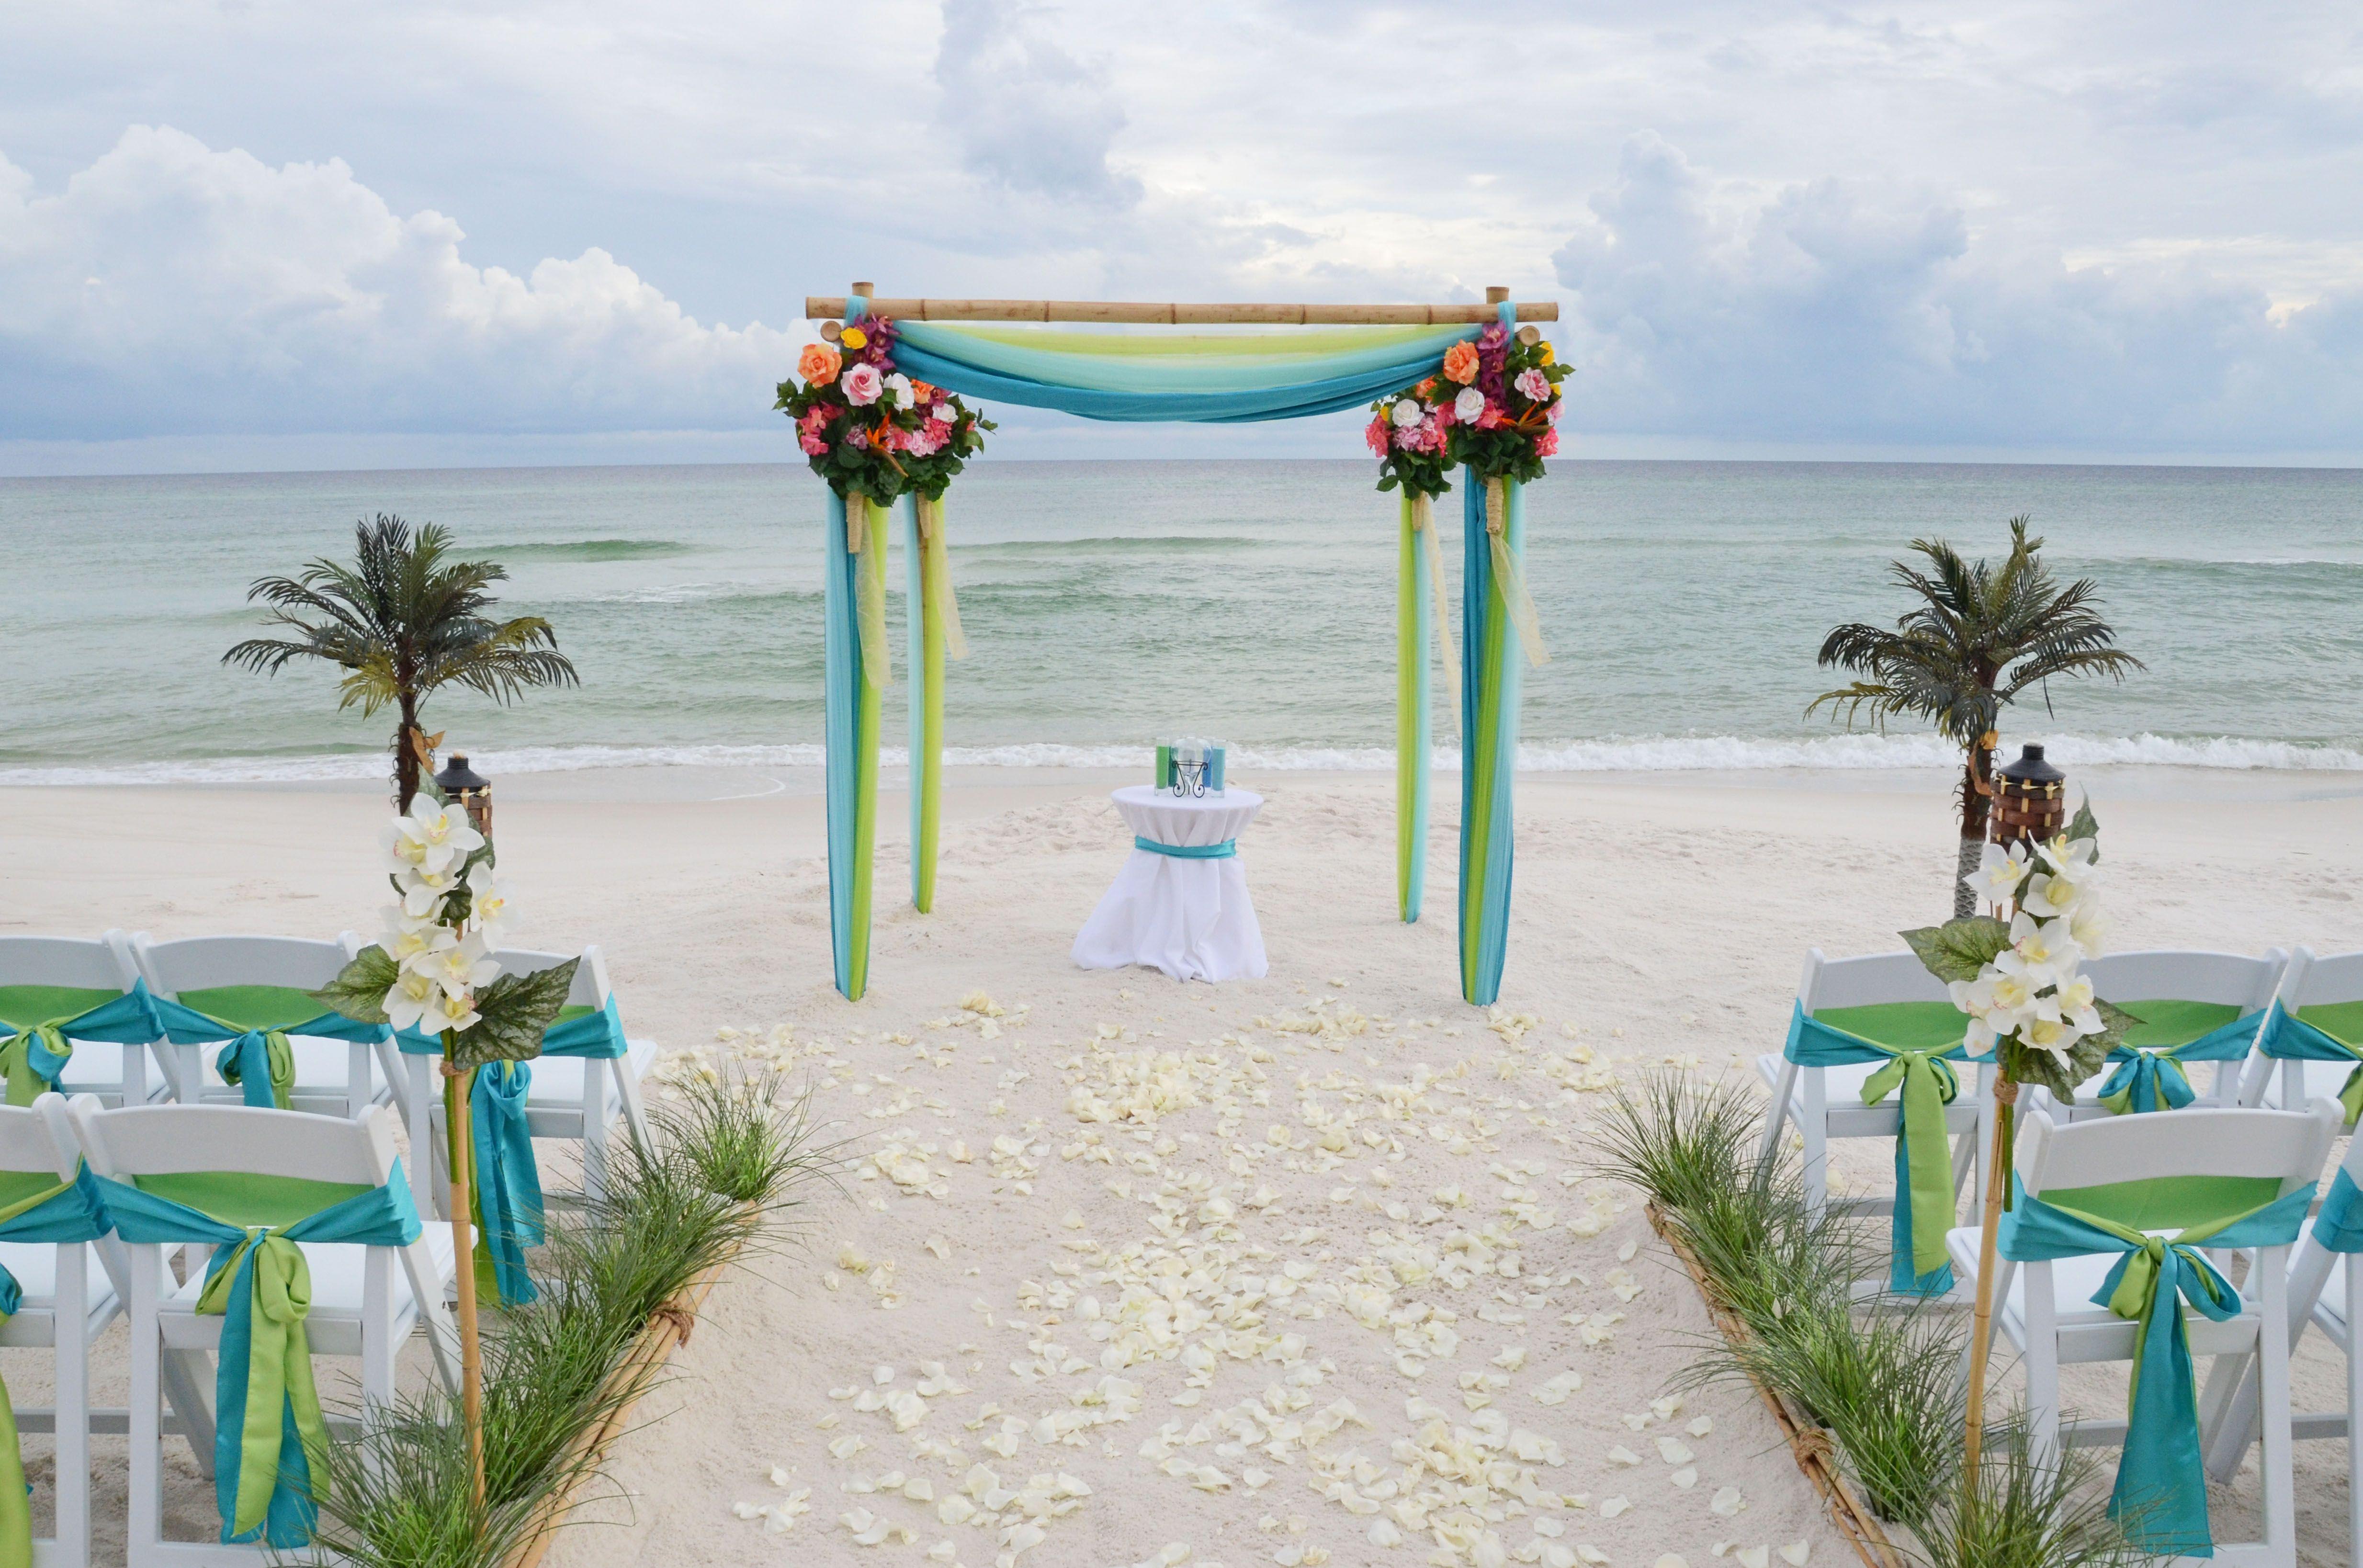 Apple Green & Turquoise beach wedding arbor. Seagrove